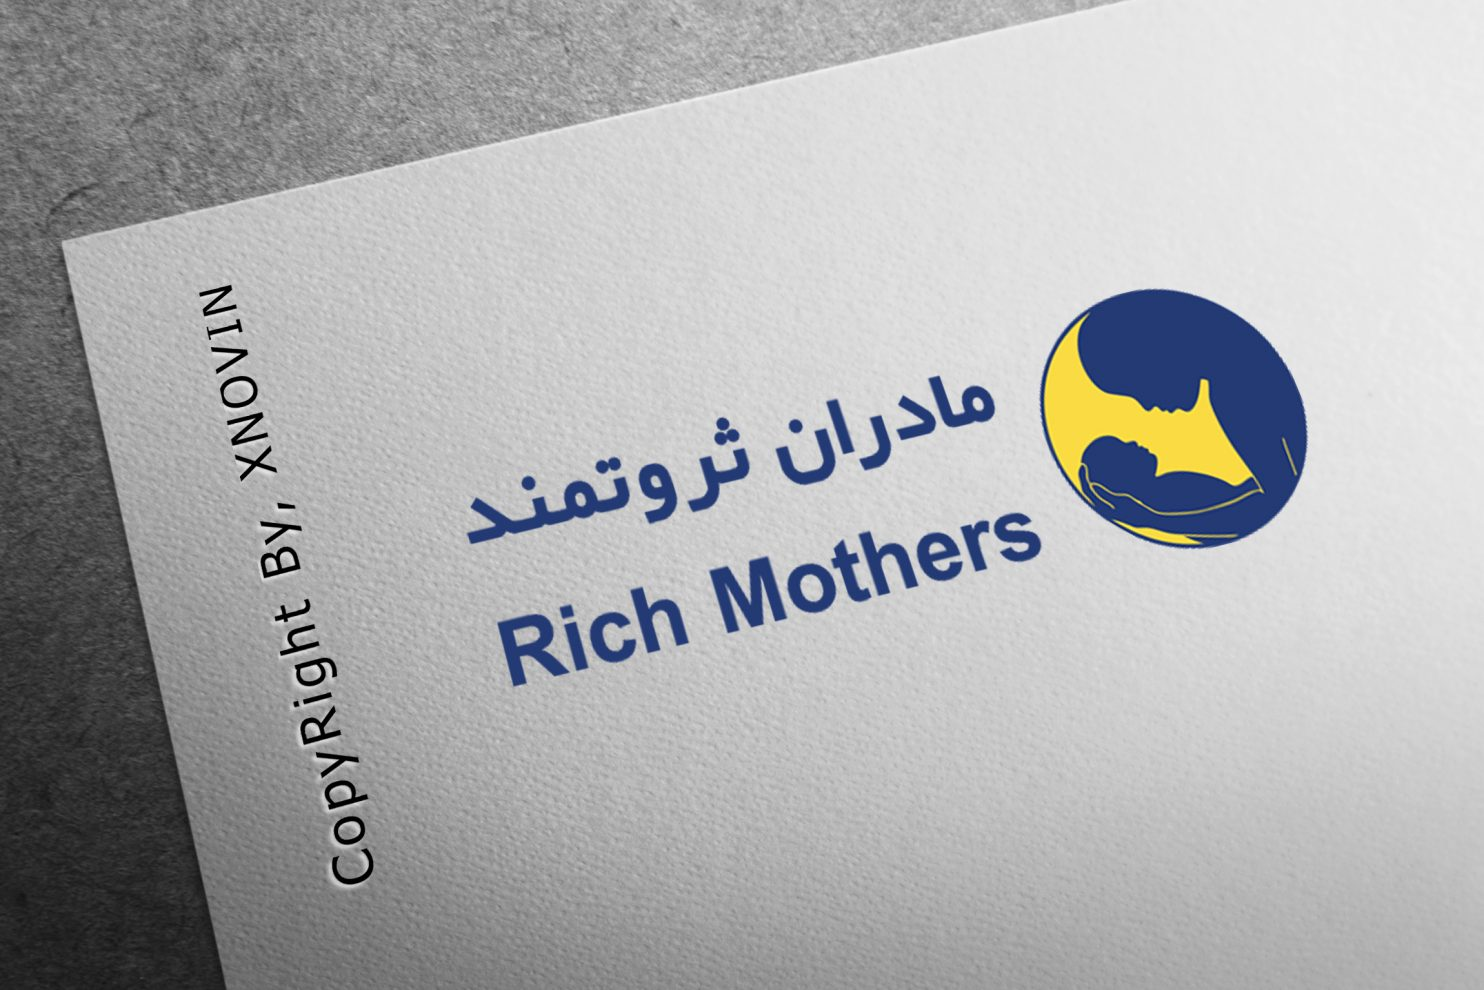 Rich Mothers Logo 1484x990 - طراحی و ساخت سایت مادران ثروتمند به همراه لوگو